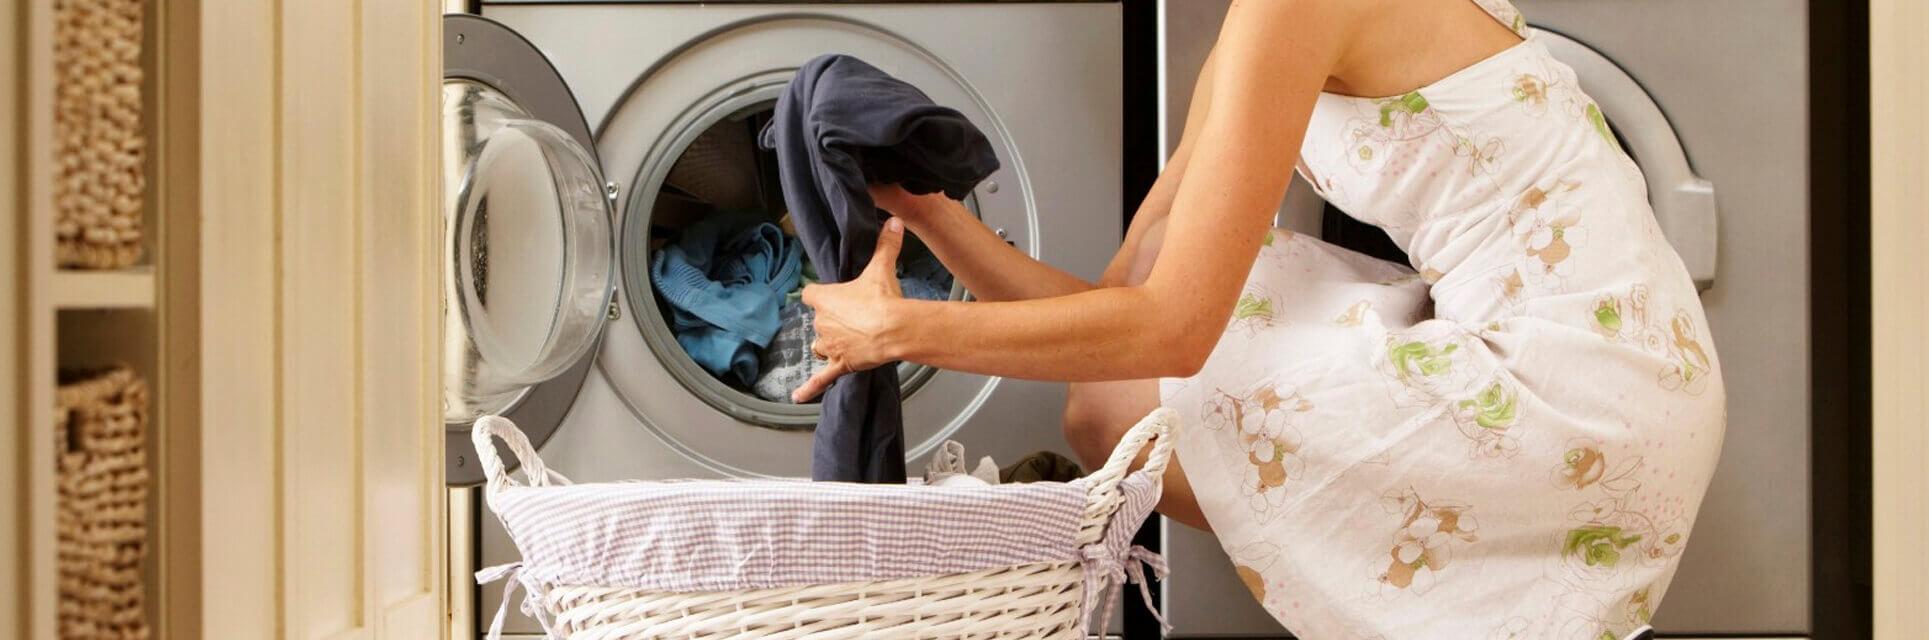 Servicio técnico lavadoras balay